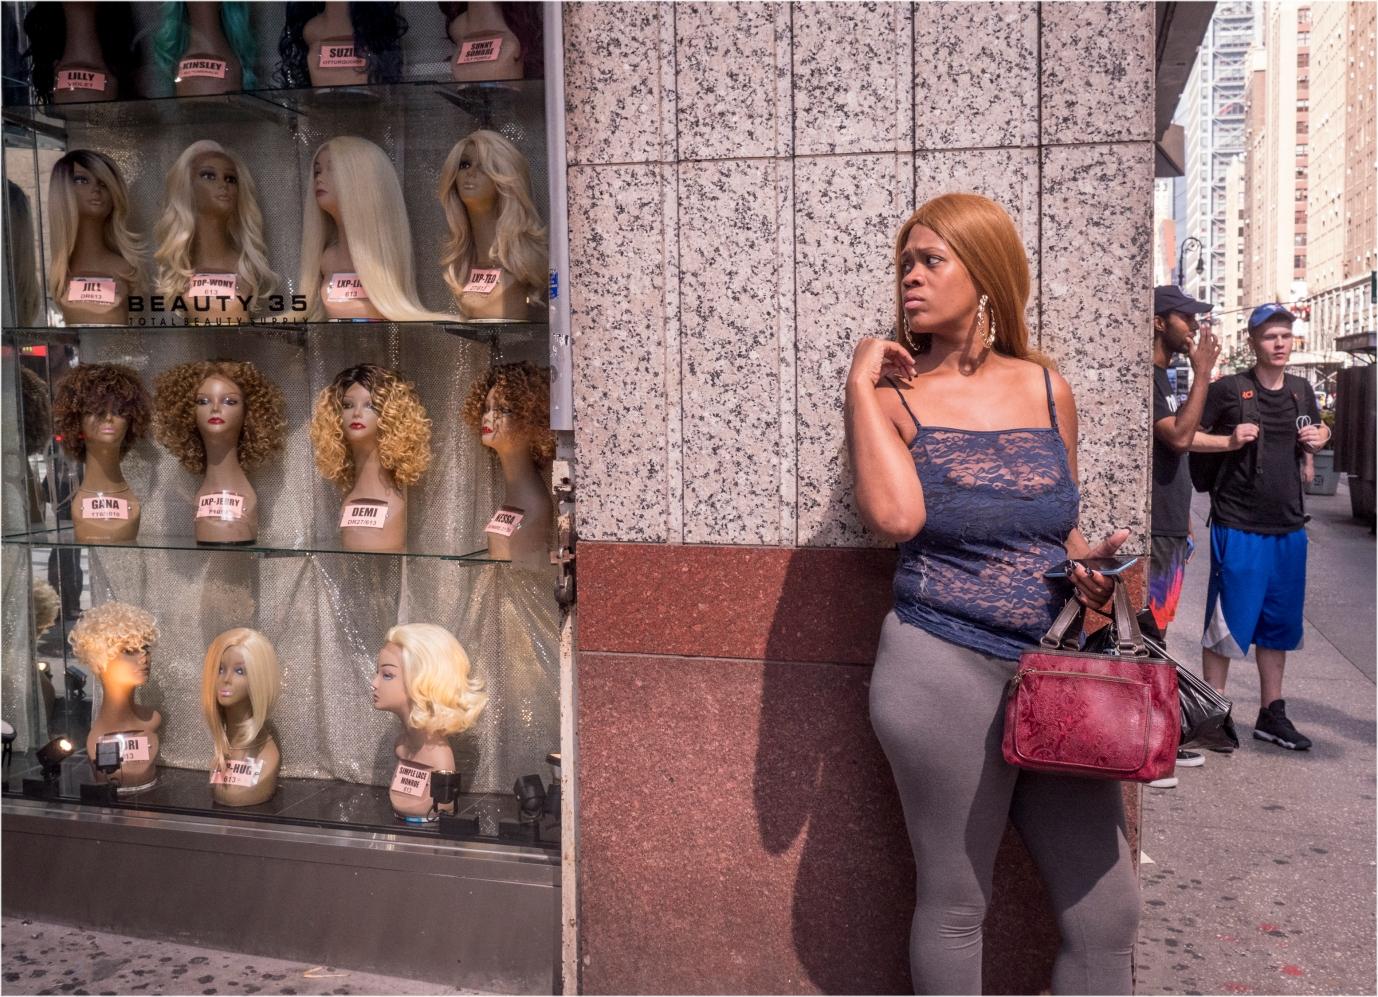 8th-black-lady-wig-store-3